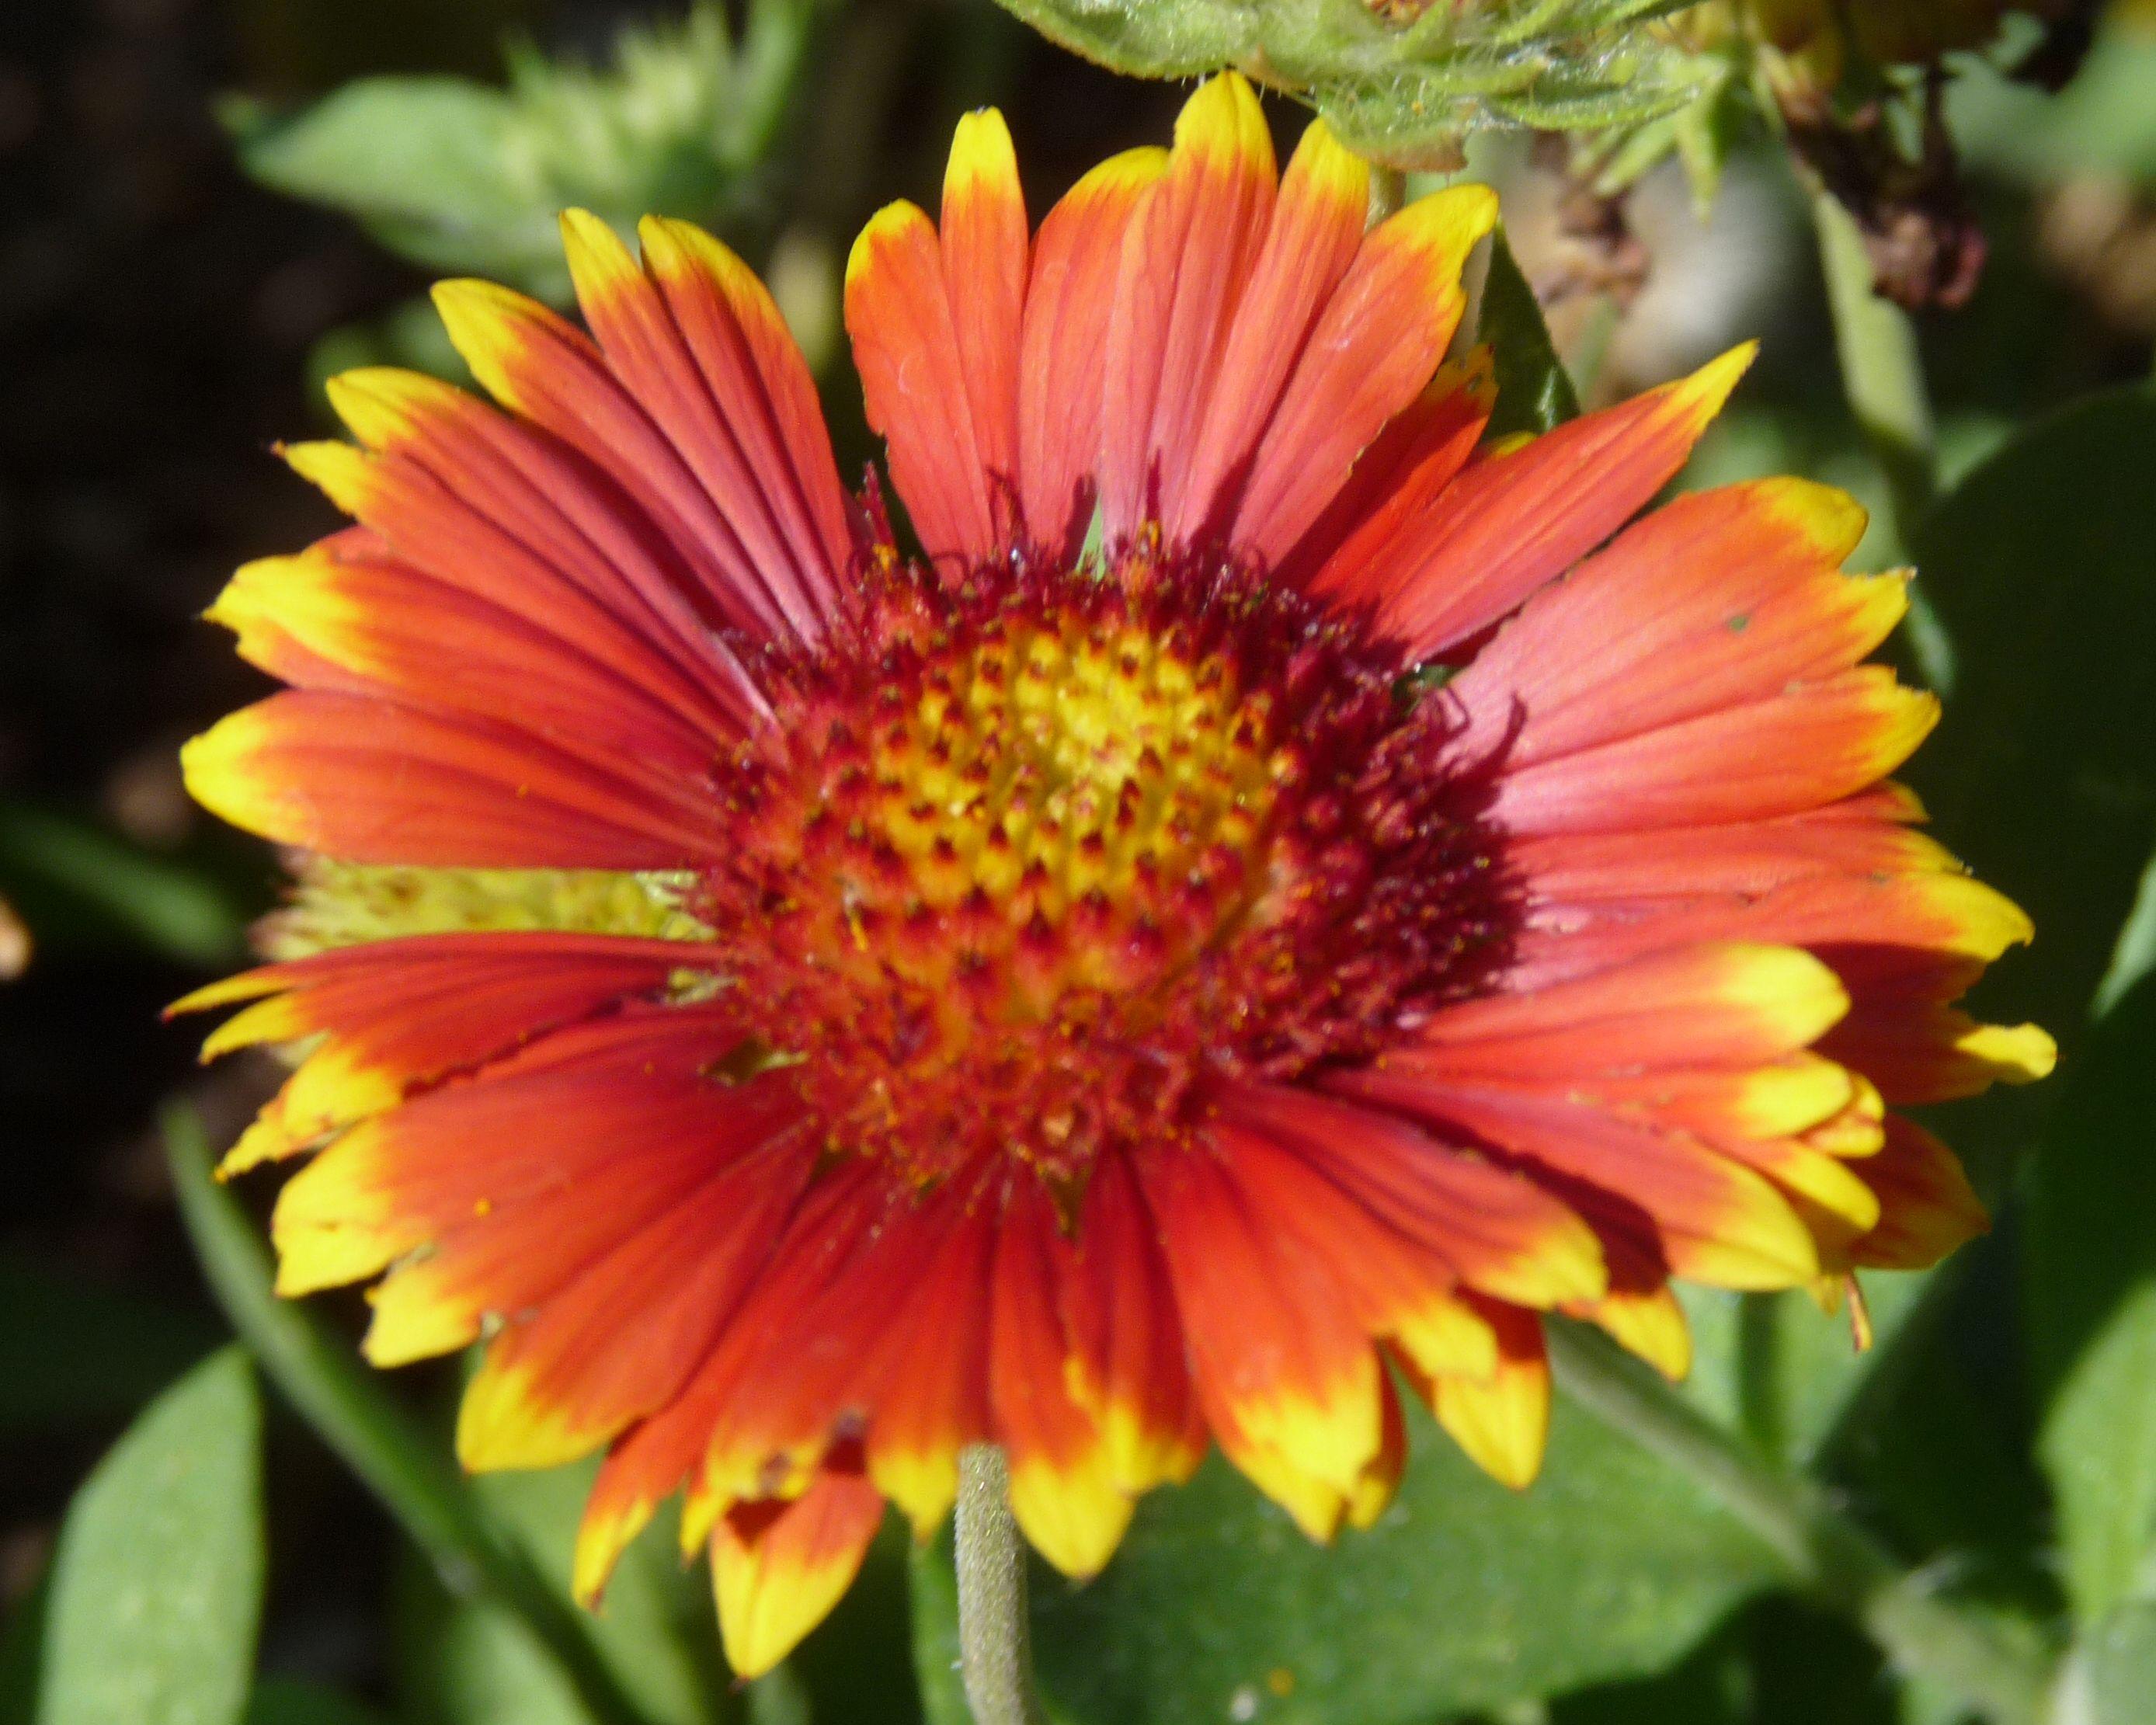 Orange Flower With Yellow Tips Flowers Orange Flowers Flowers